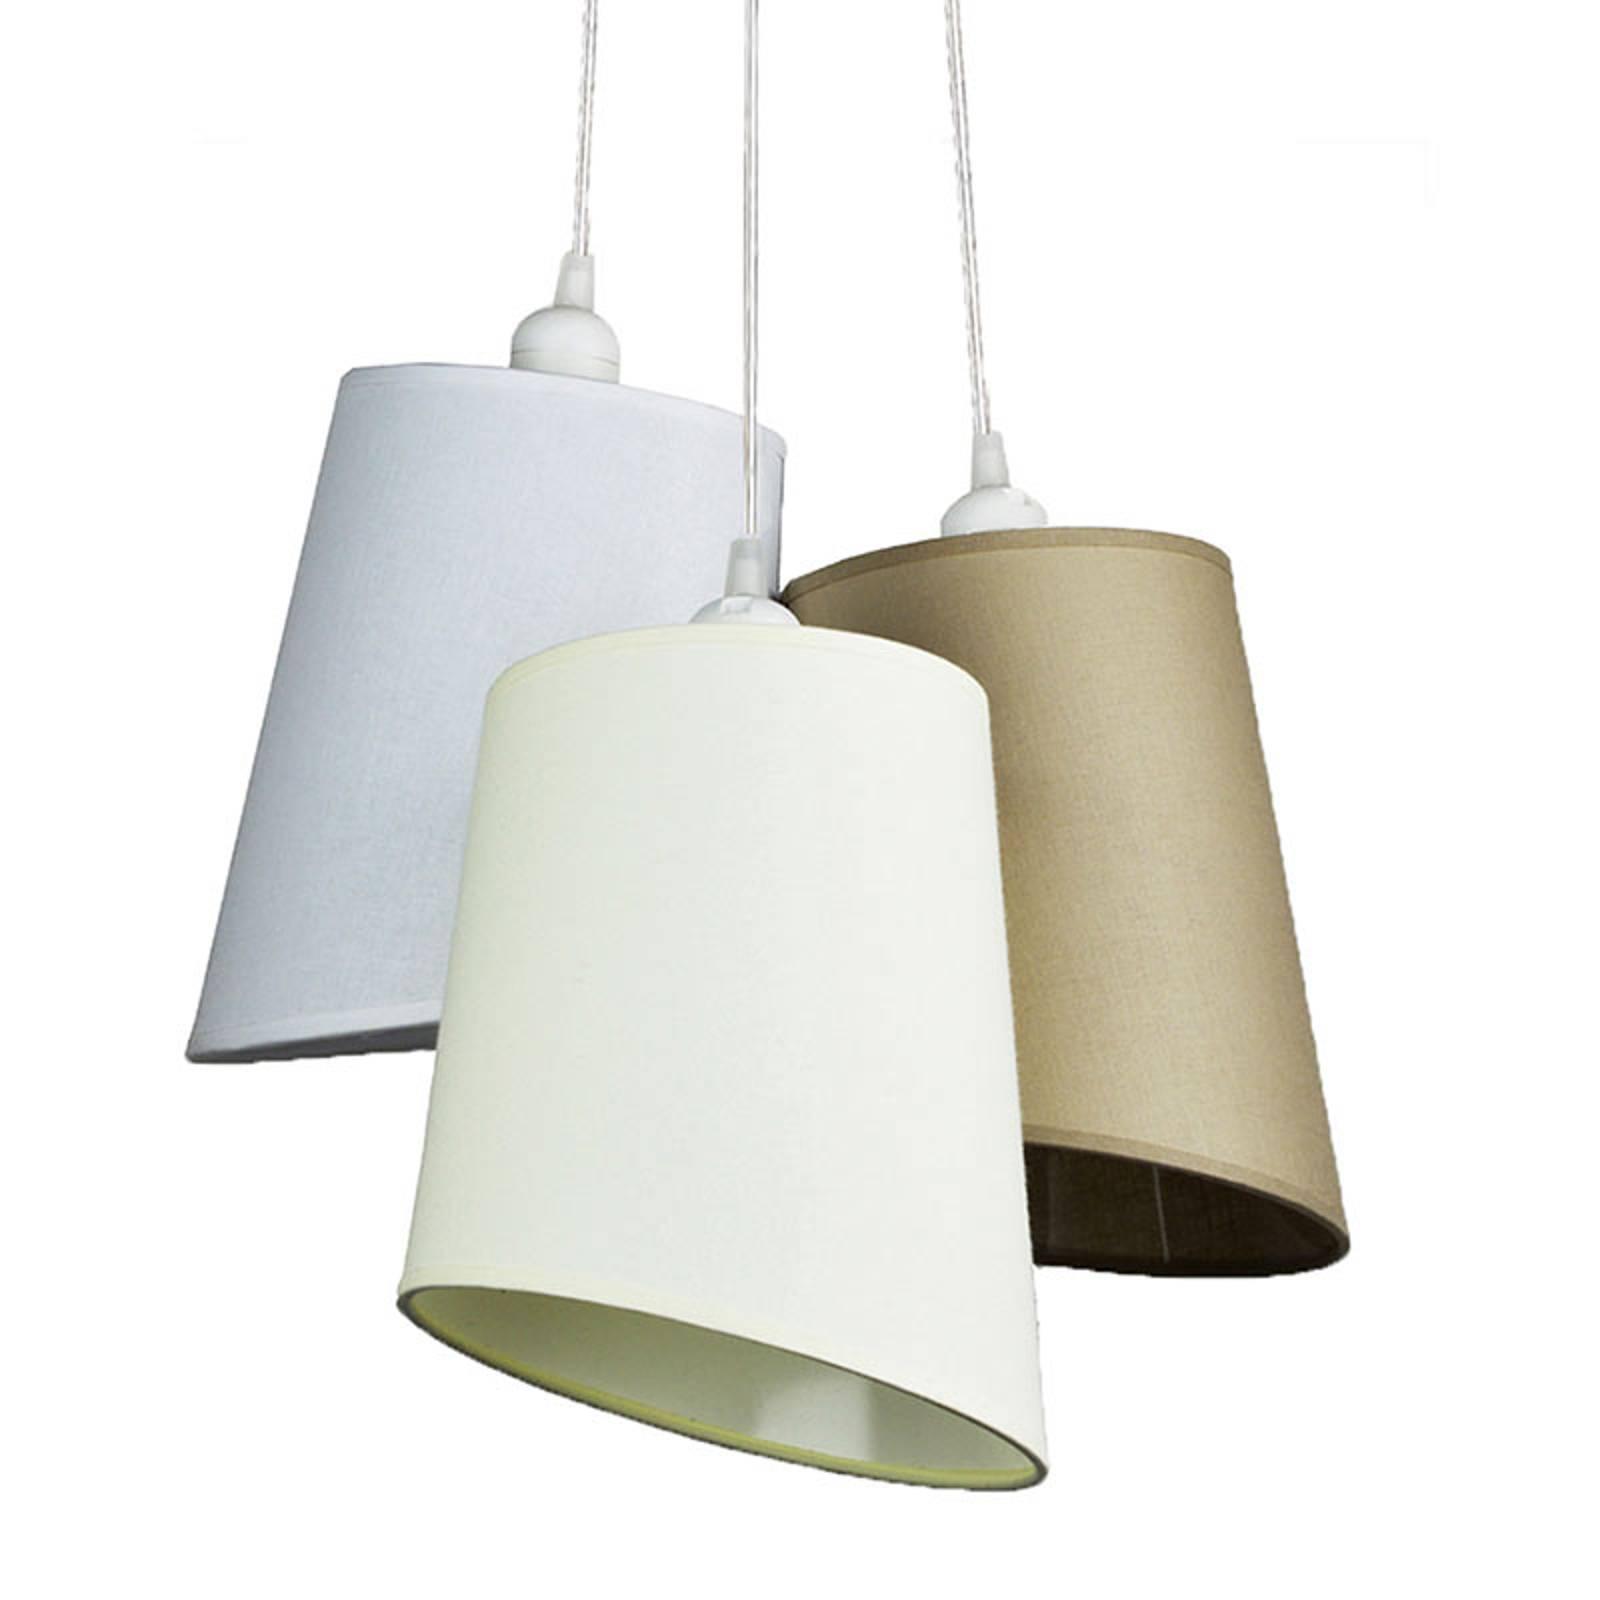 Riippuvalo Verona 3-lamp. valkoinen/écru/beige